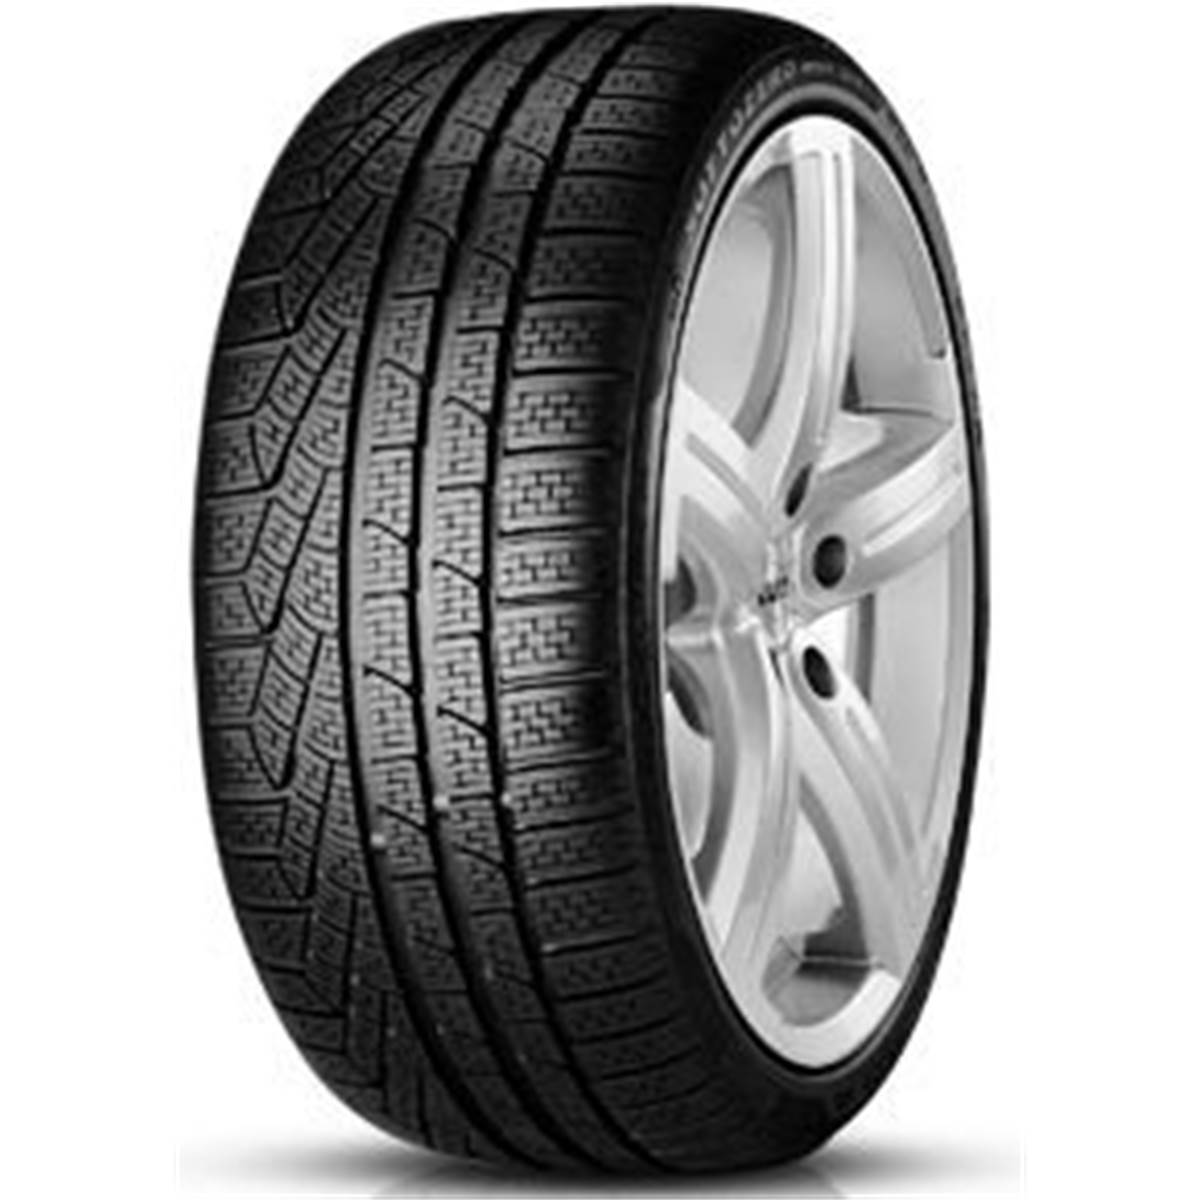 Pirelli Winter 210 Sottozero Ii Xl